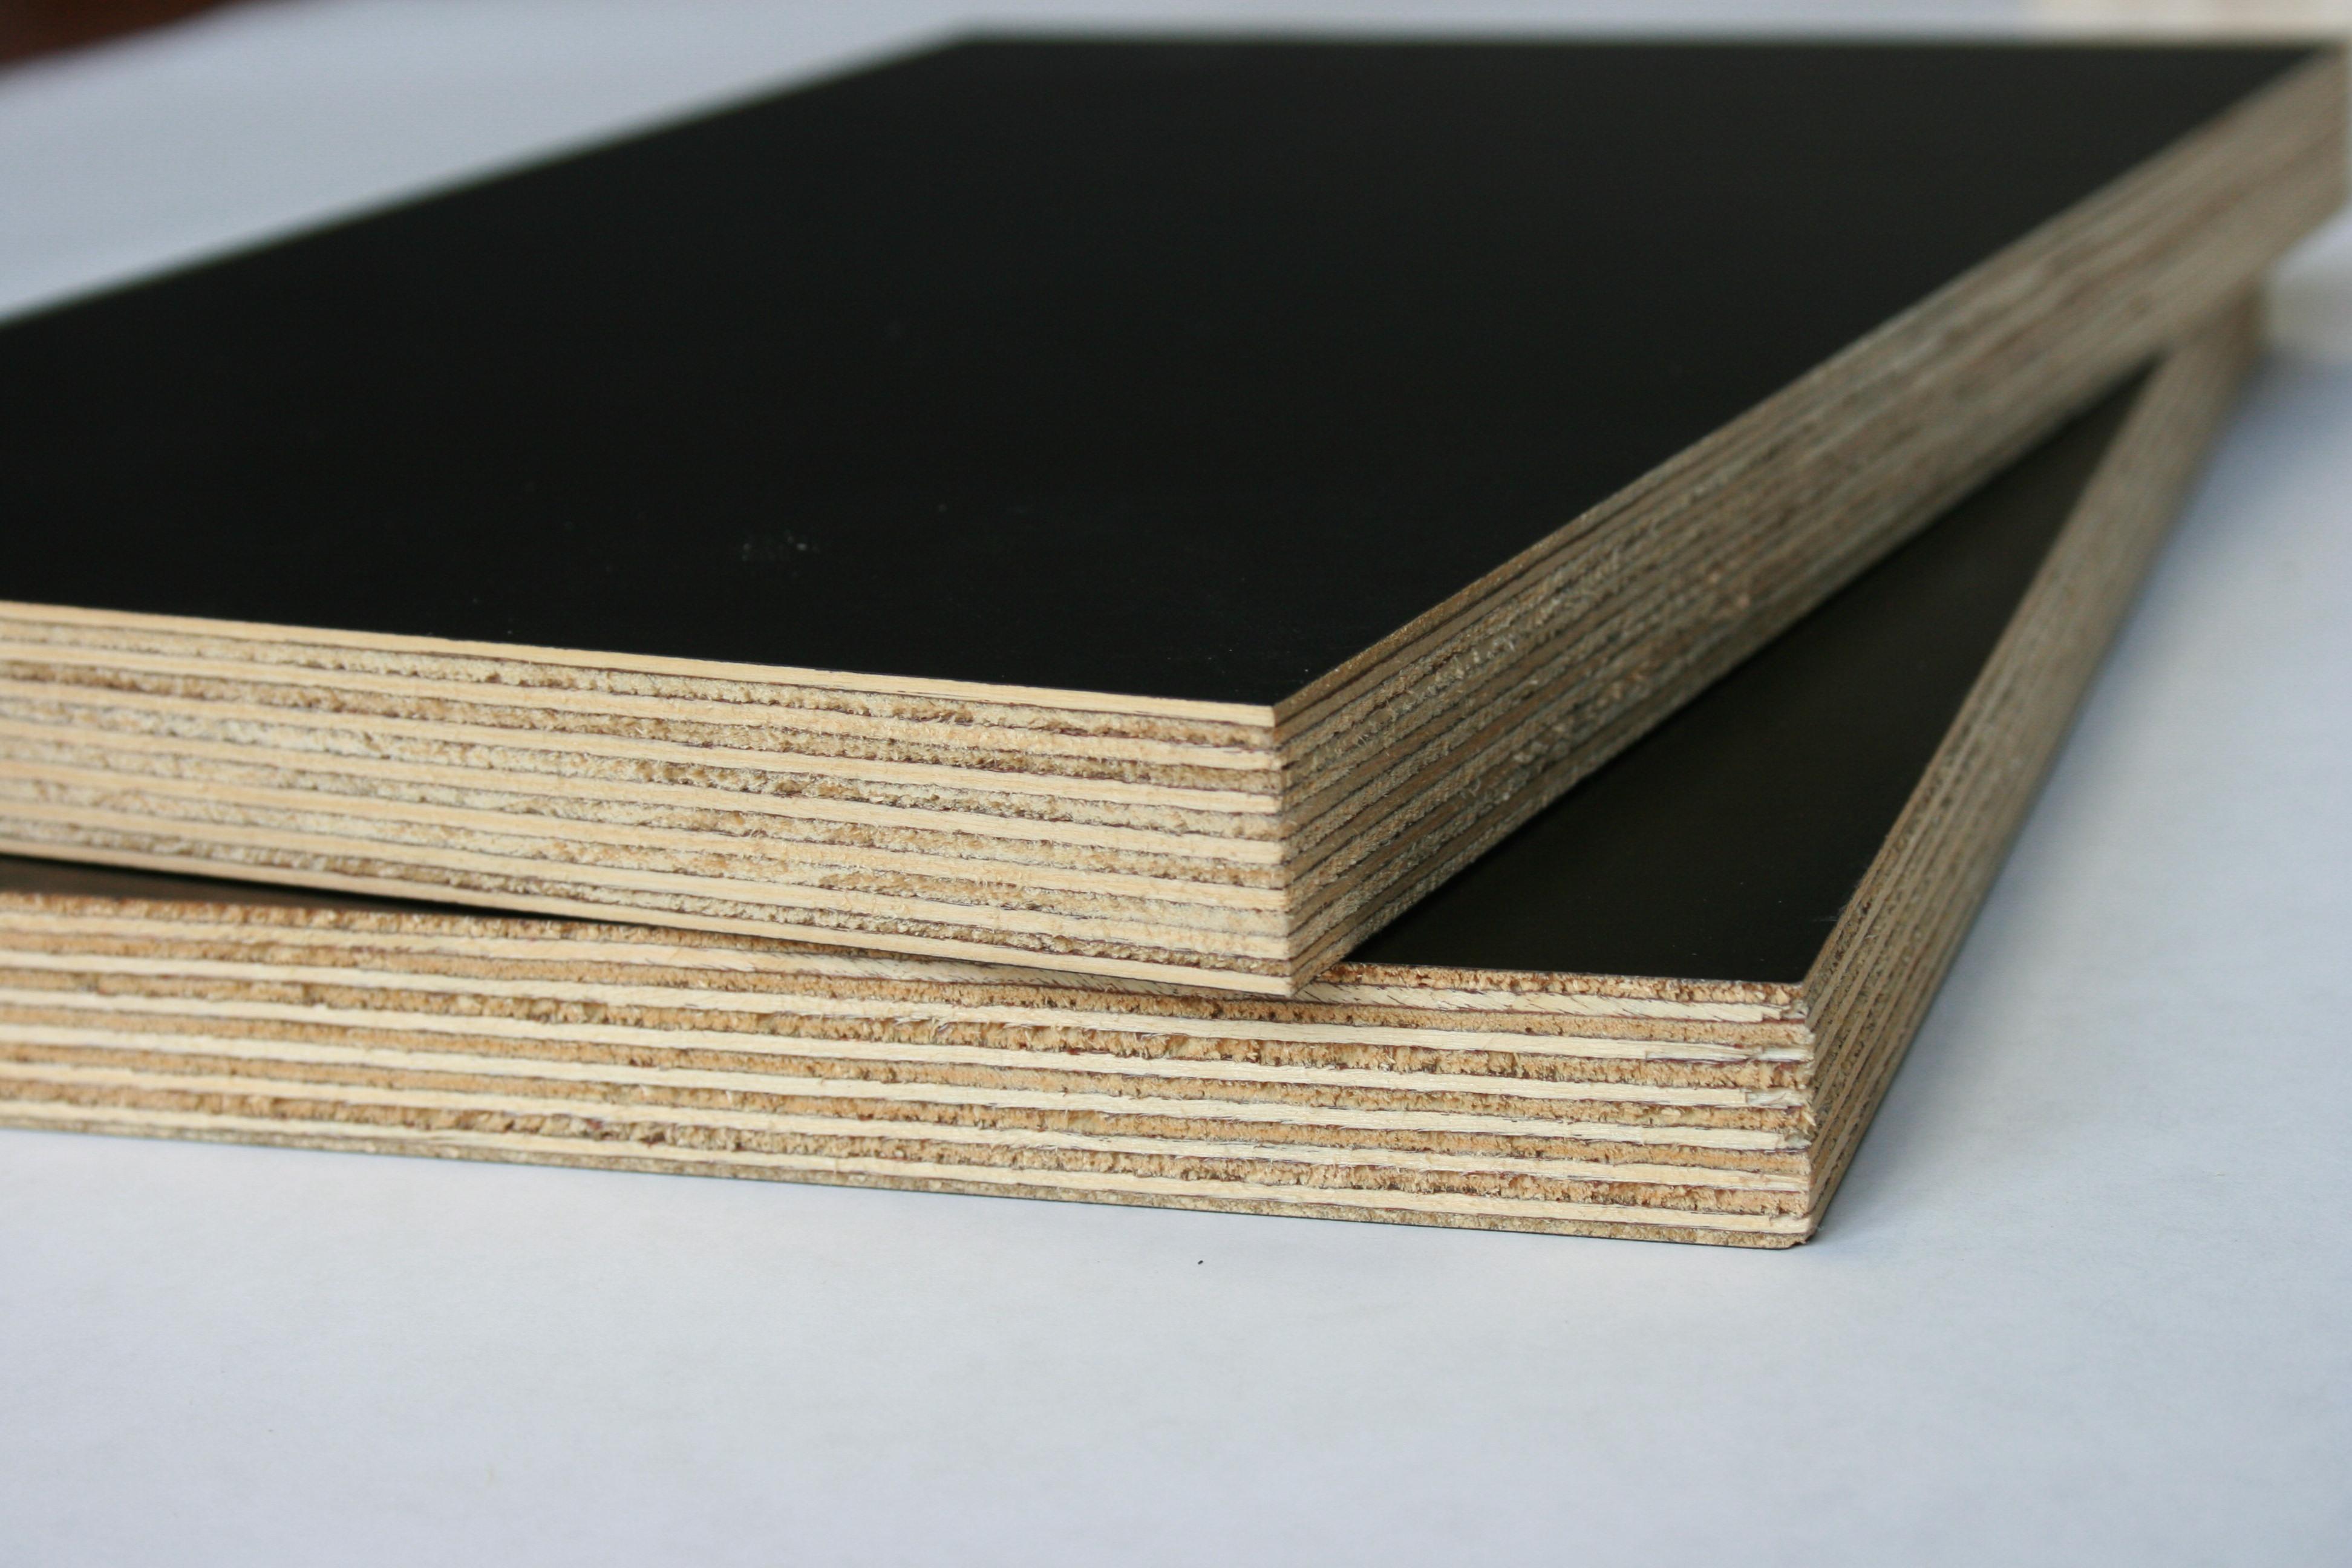 Film-faced poplar plywood